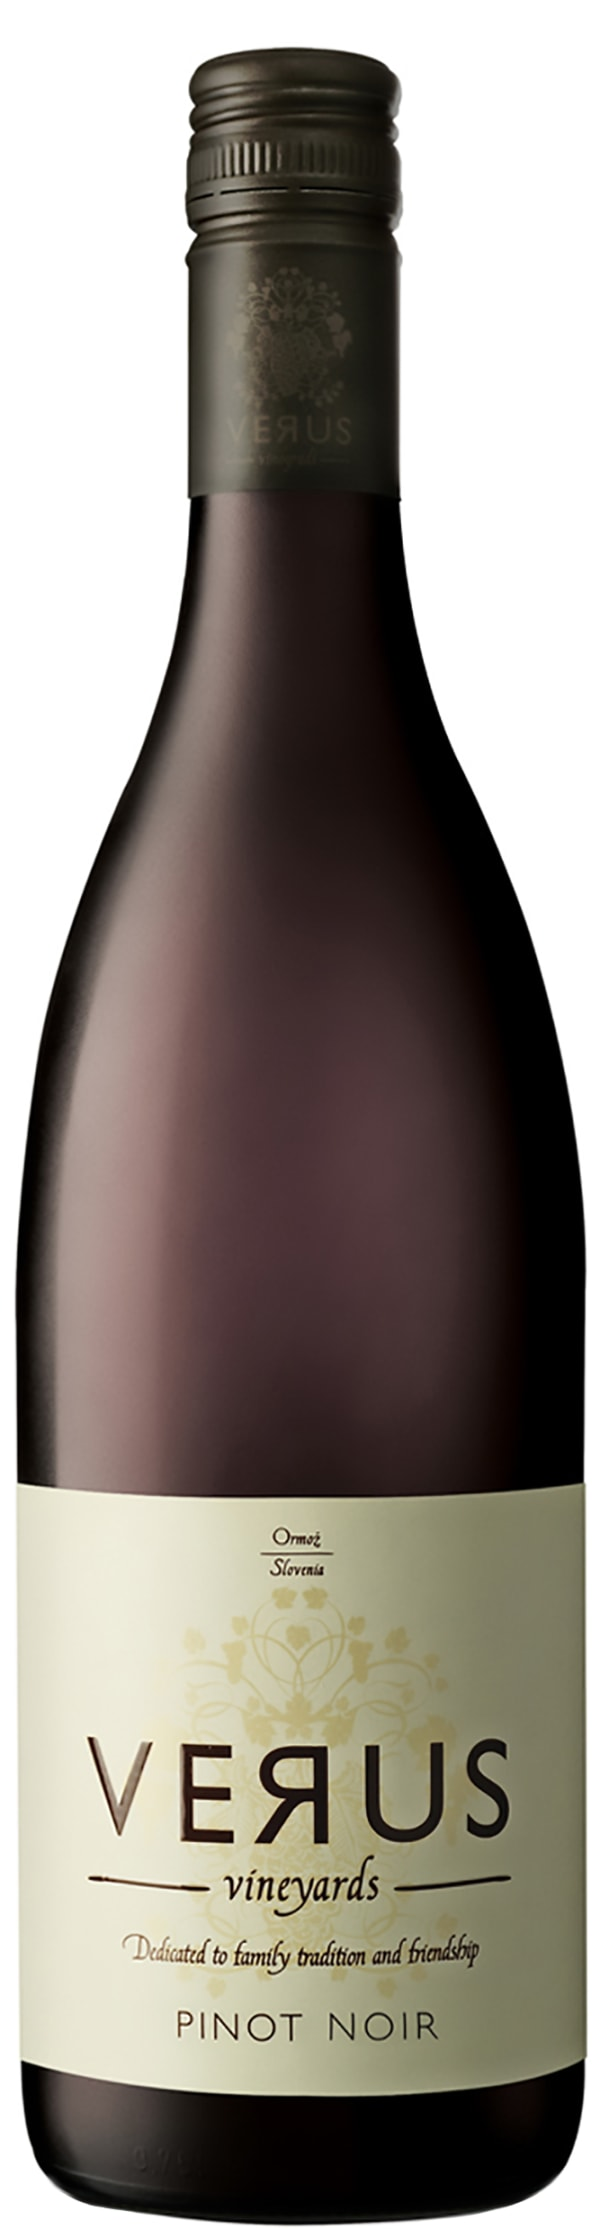 Verus Pinot Noir 2015